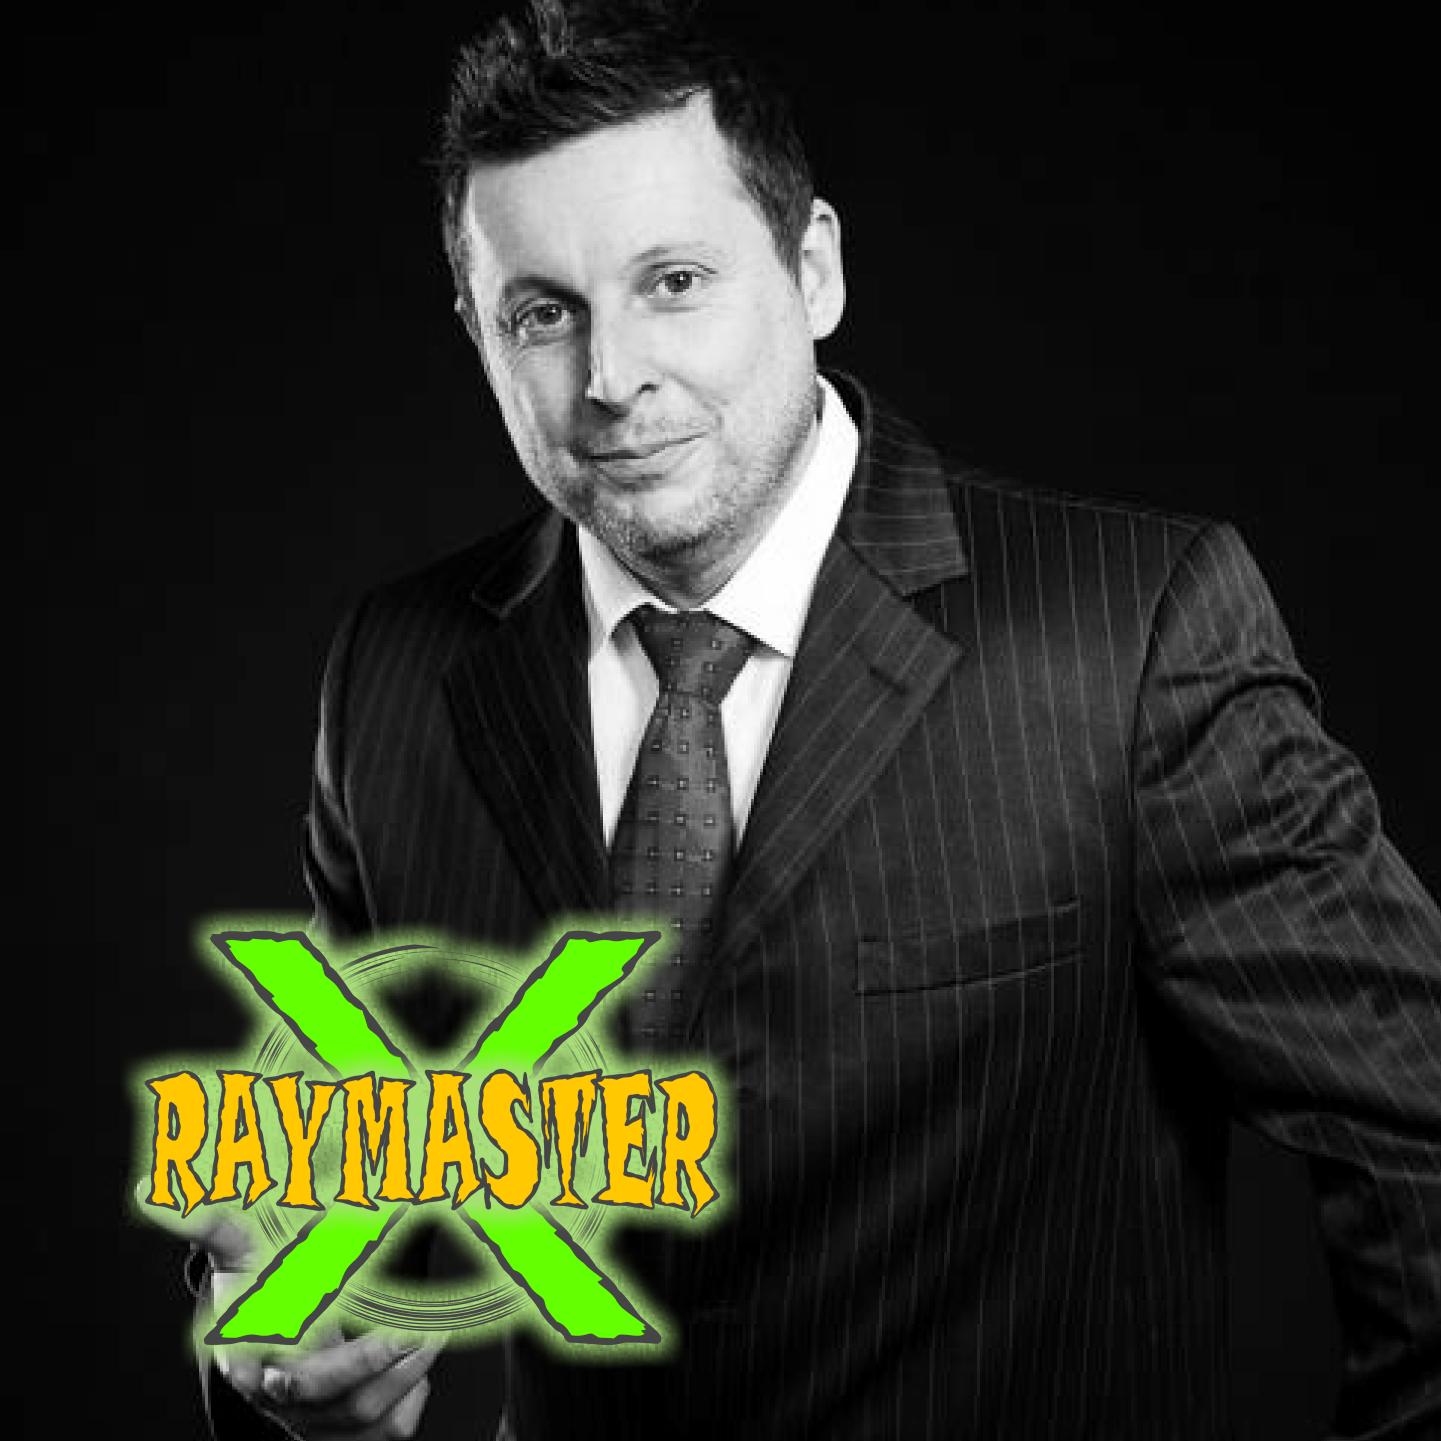 RaymasterXXL